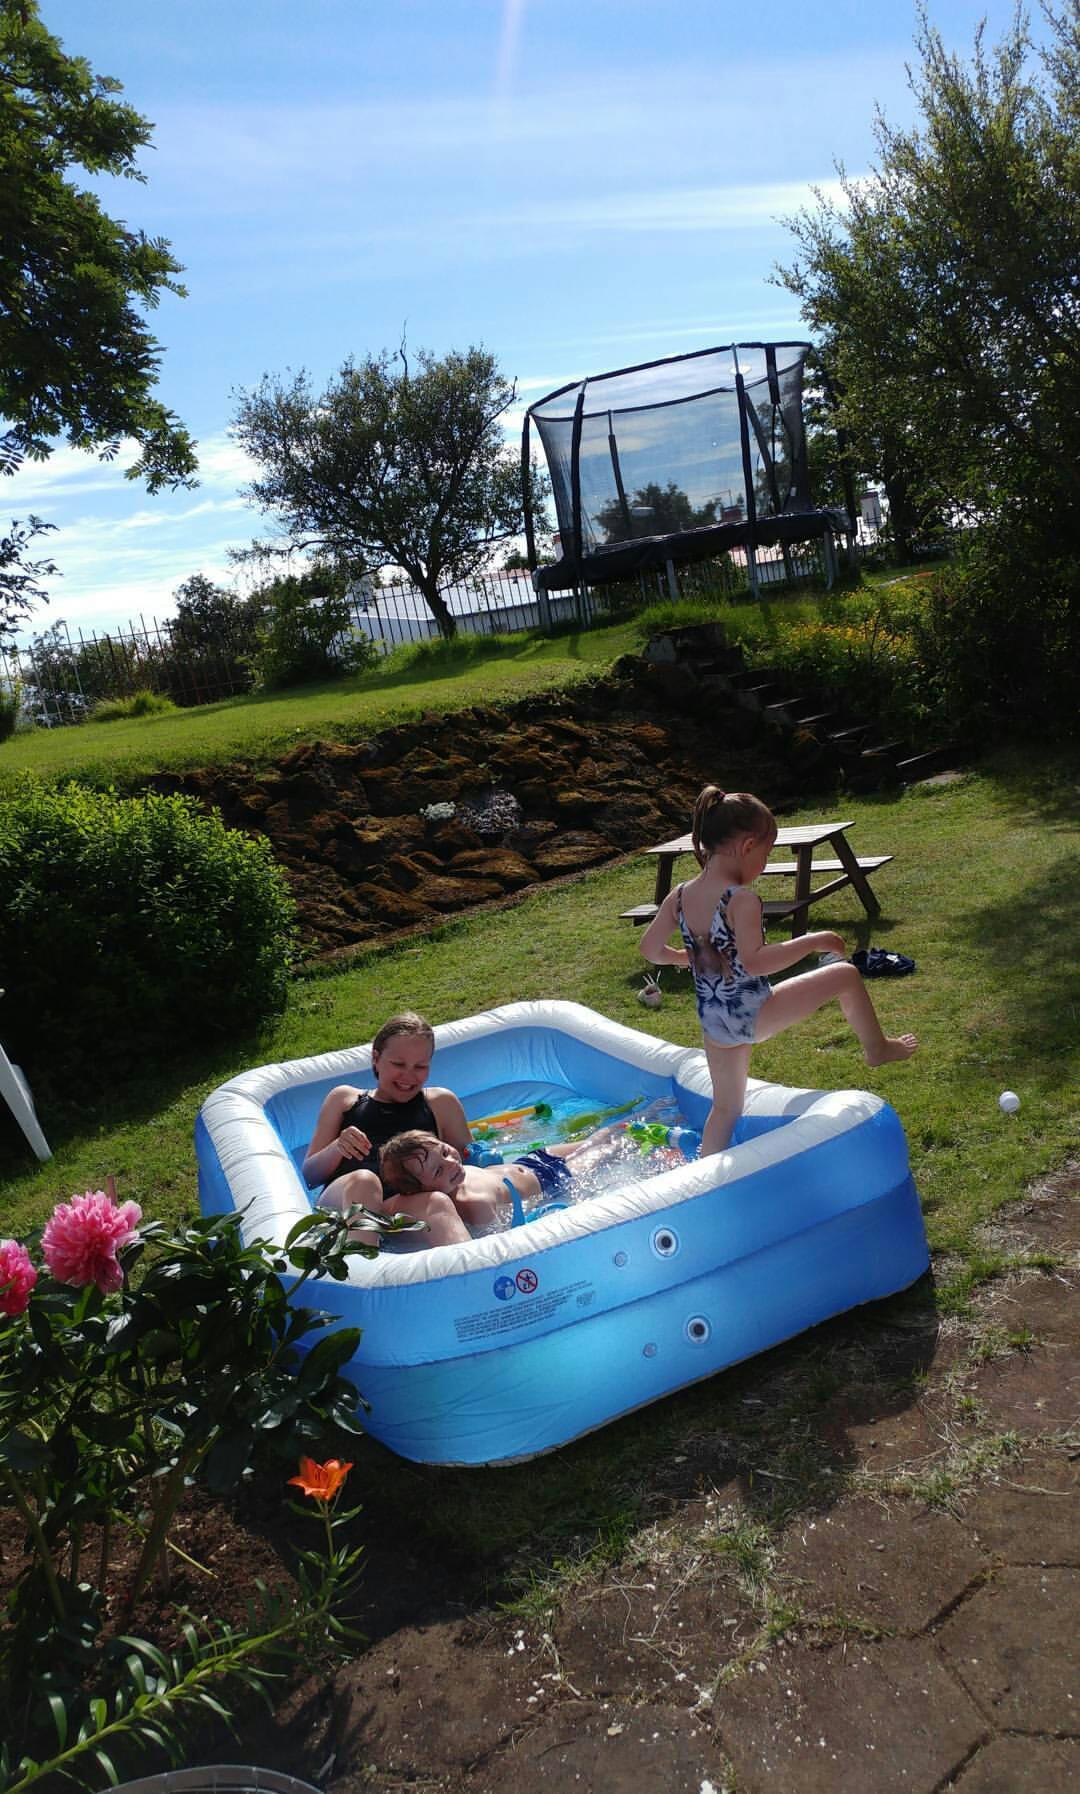 Garden pool 🌊